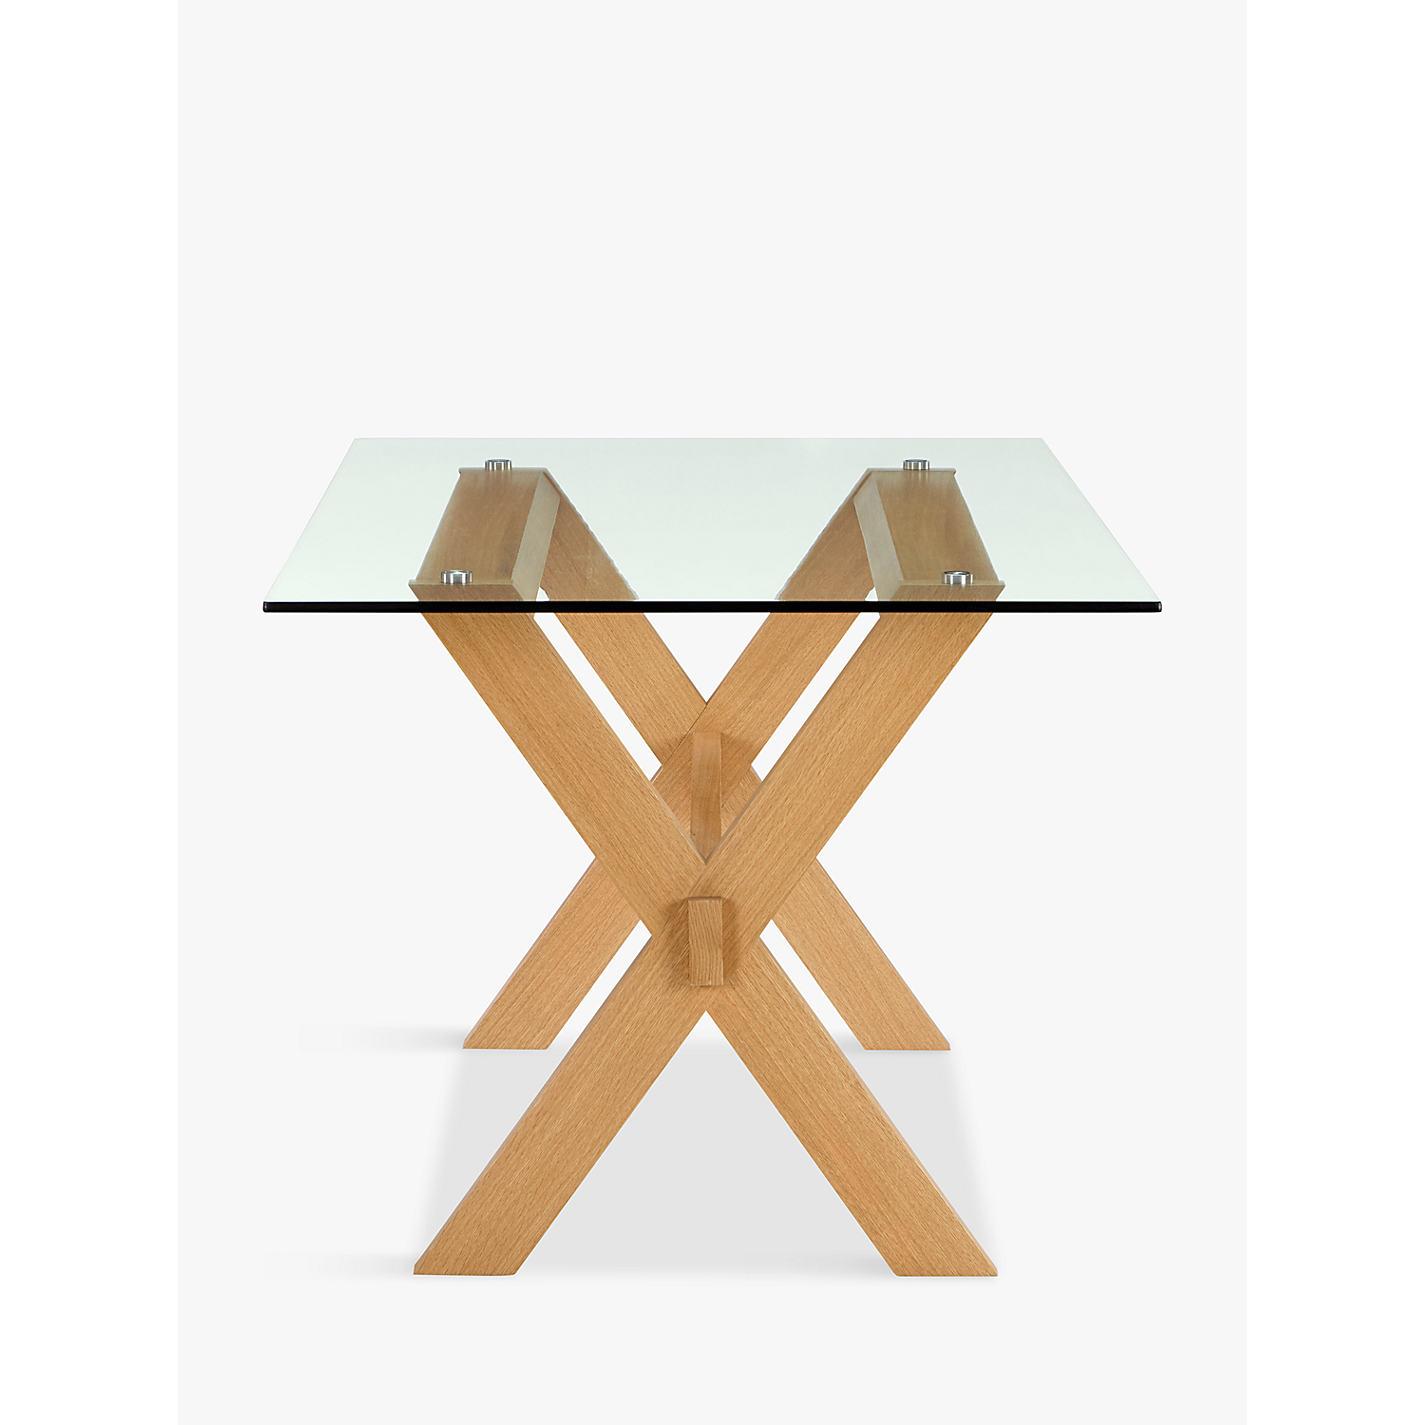 Elegant Small Dining Table John Lewis Light of Dining Room : 236509888alt4prodexlrg from www.lightofdiningroom.com size 1425 x 1425 jpeg 149kB